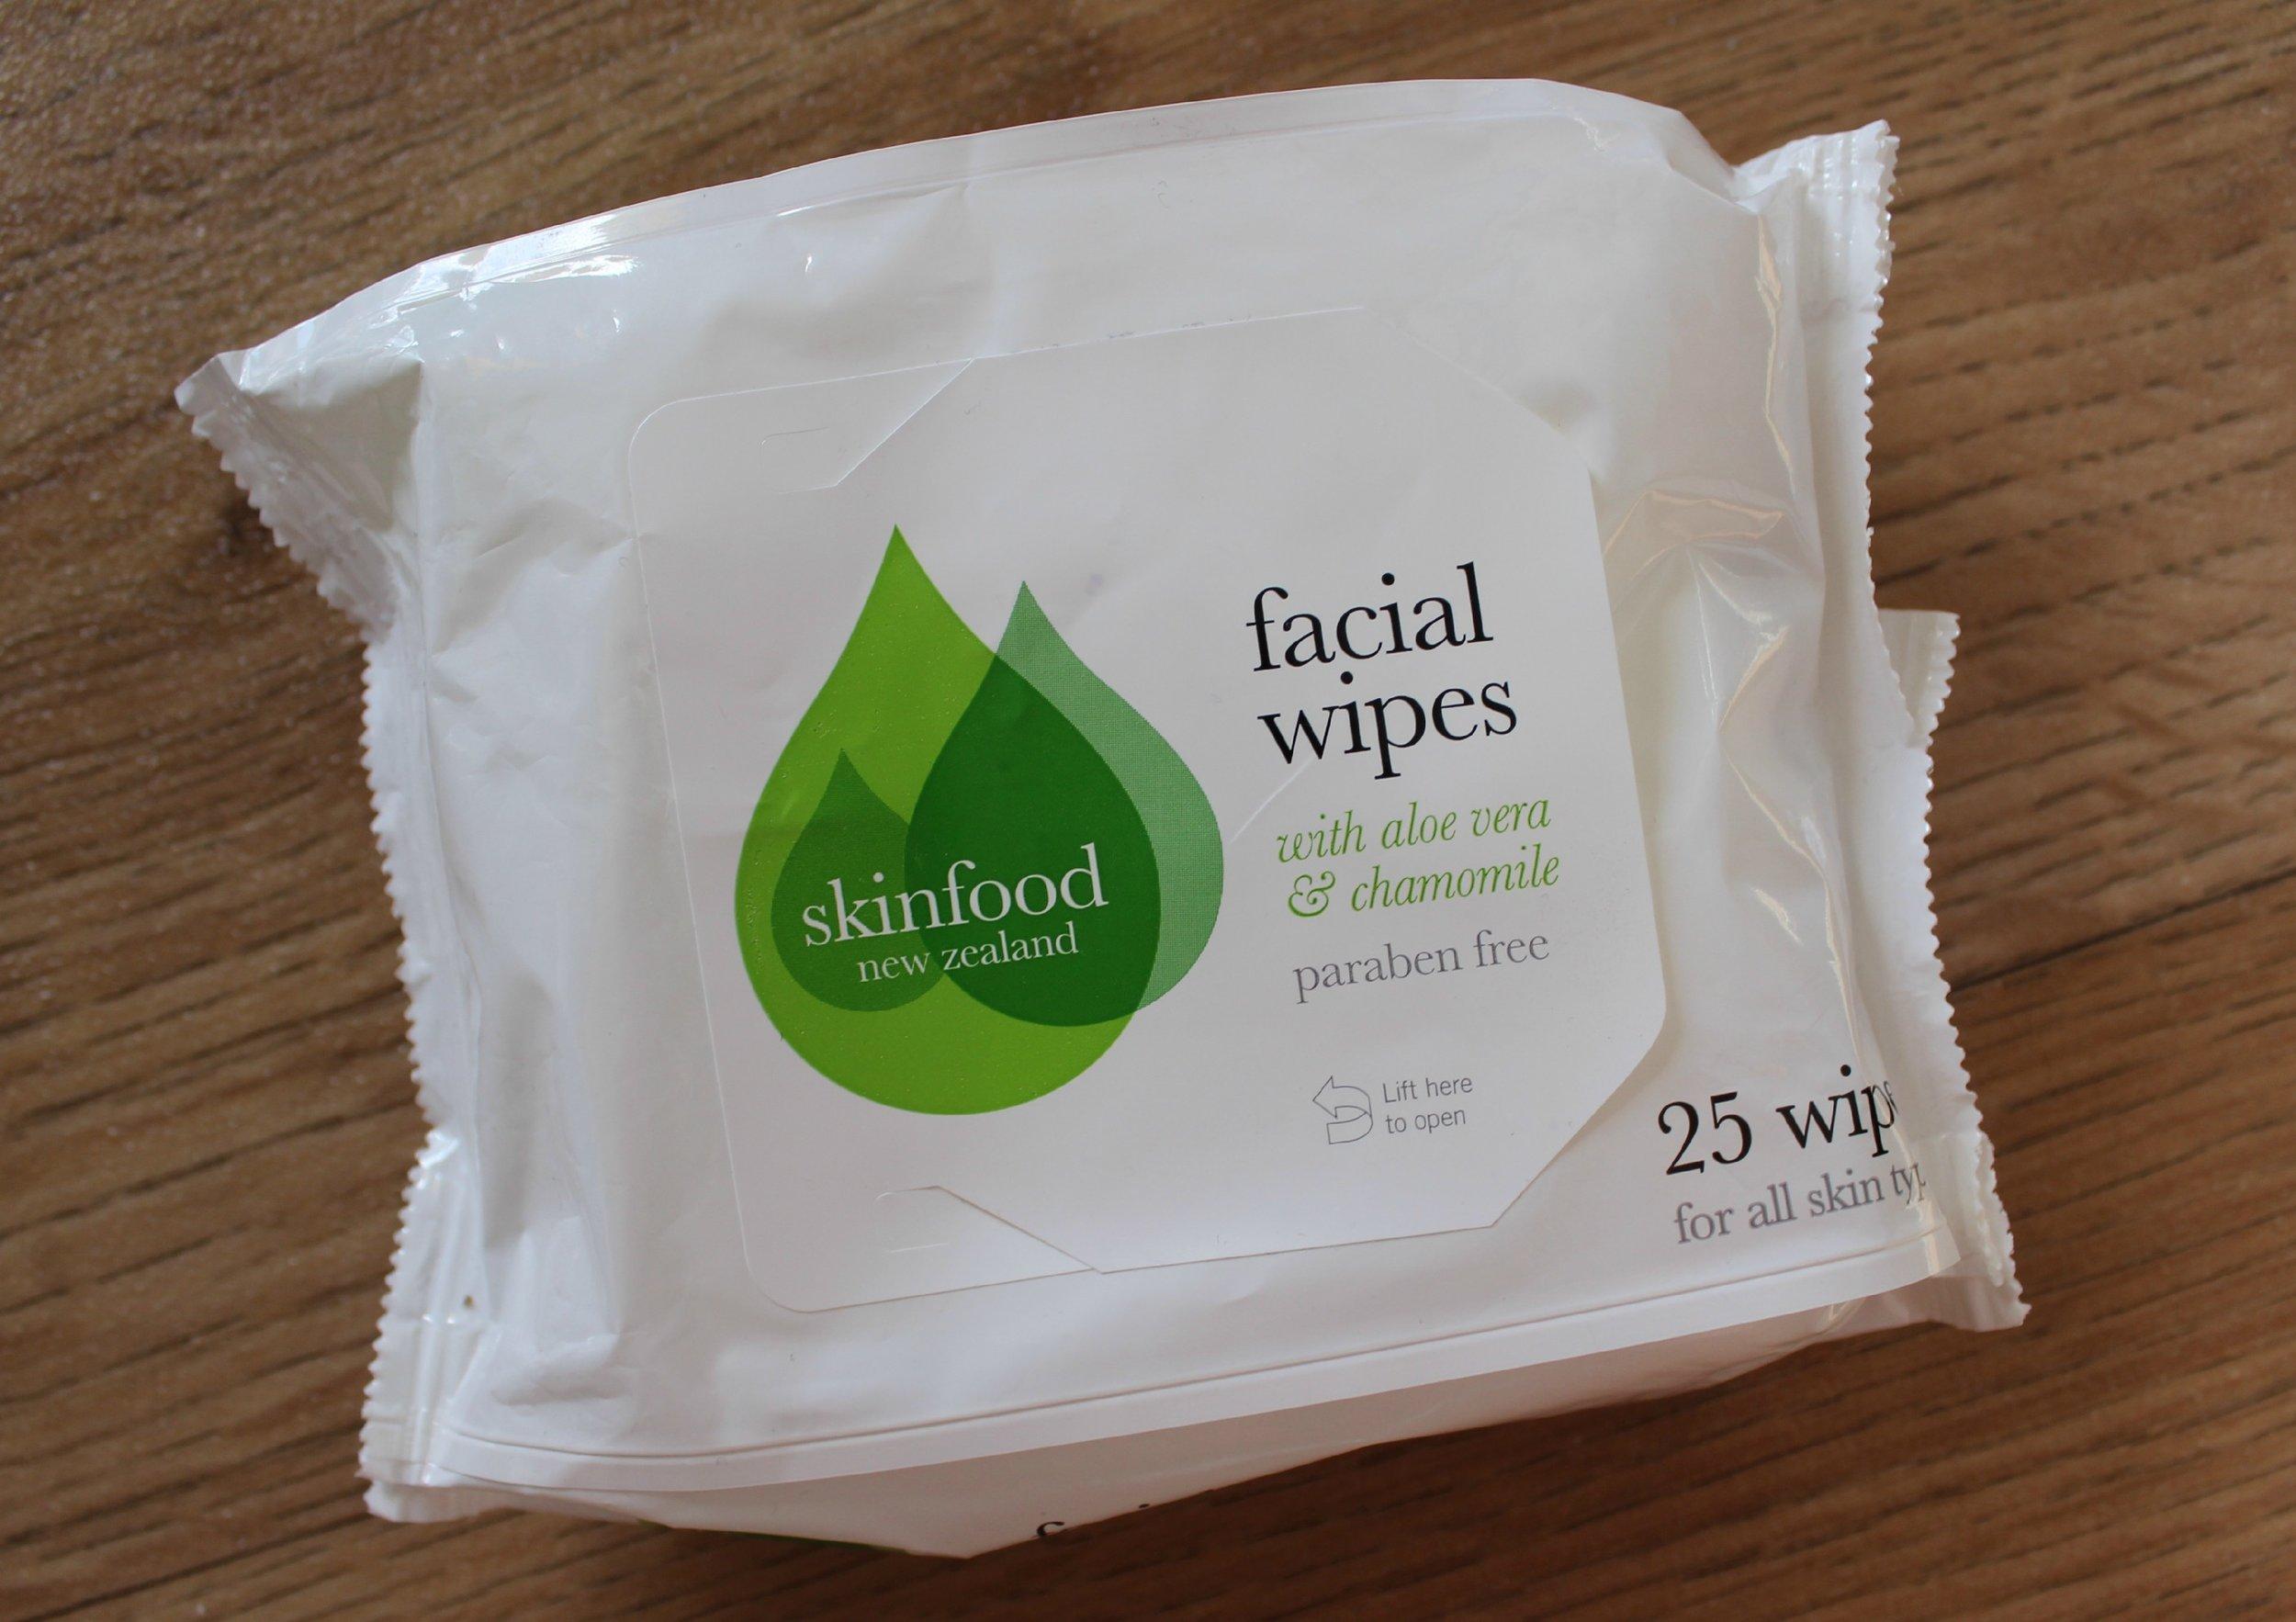 Skinfood Facial Wipes Review  EmmaLouisa.com